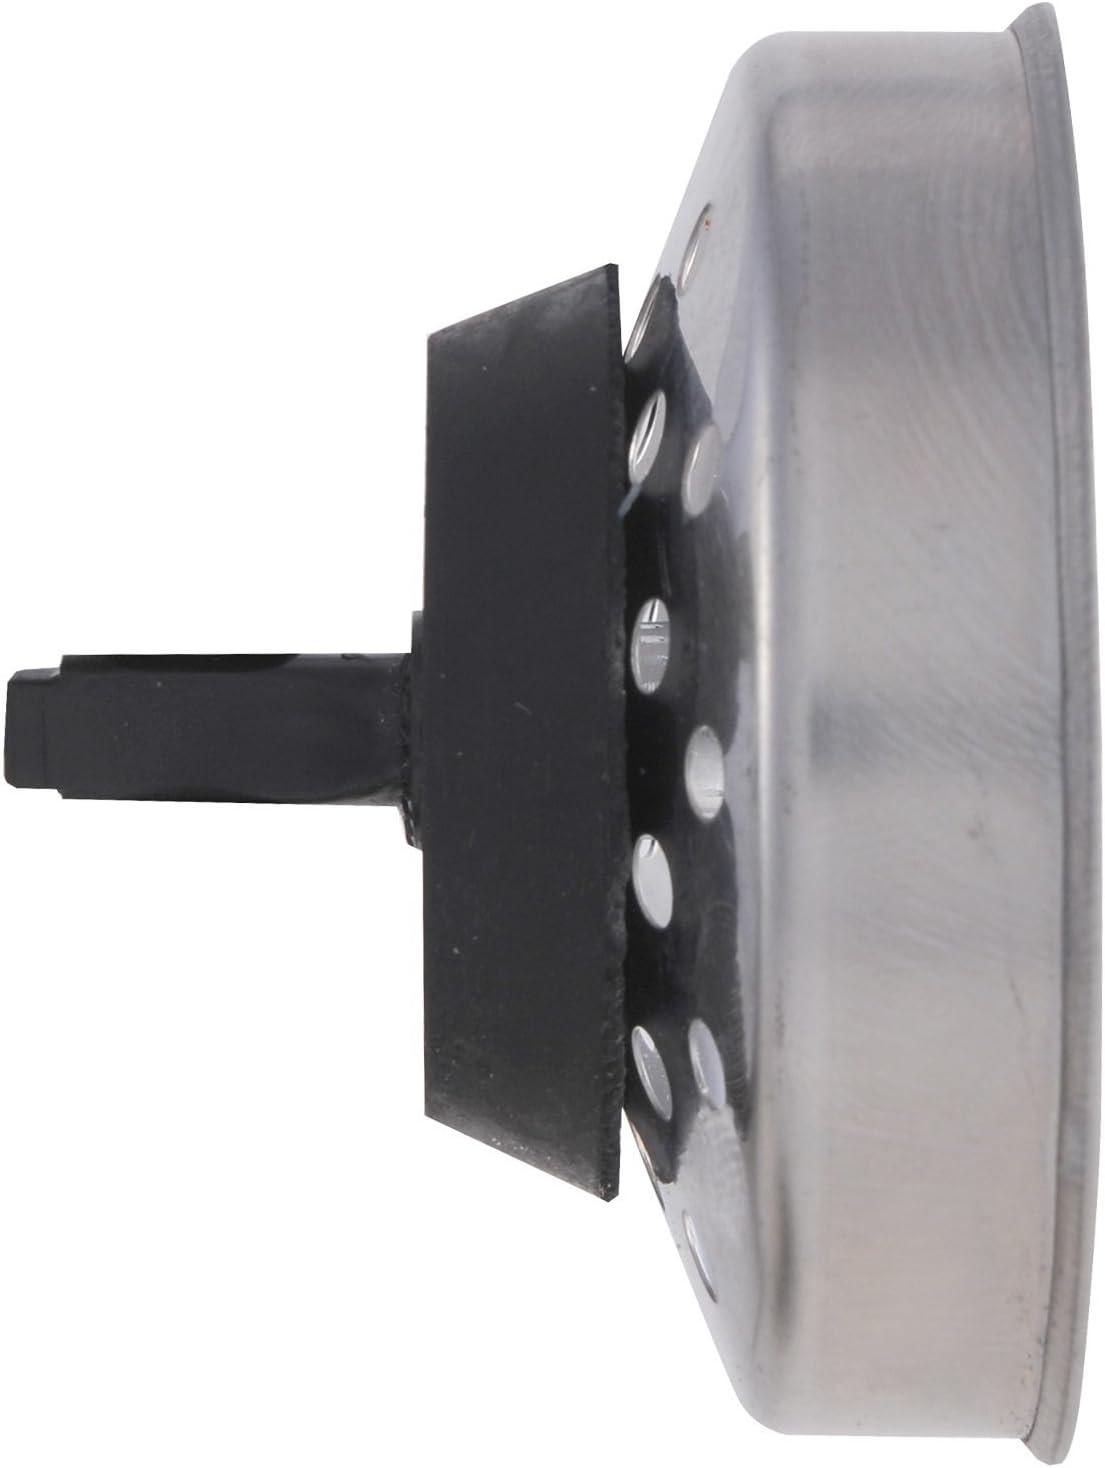 LDR Industries 501 2200 Sink Basket Black